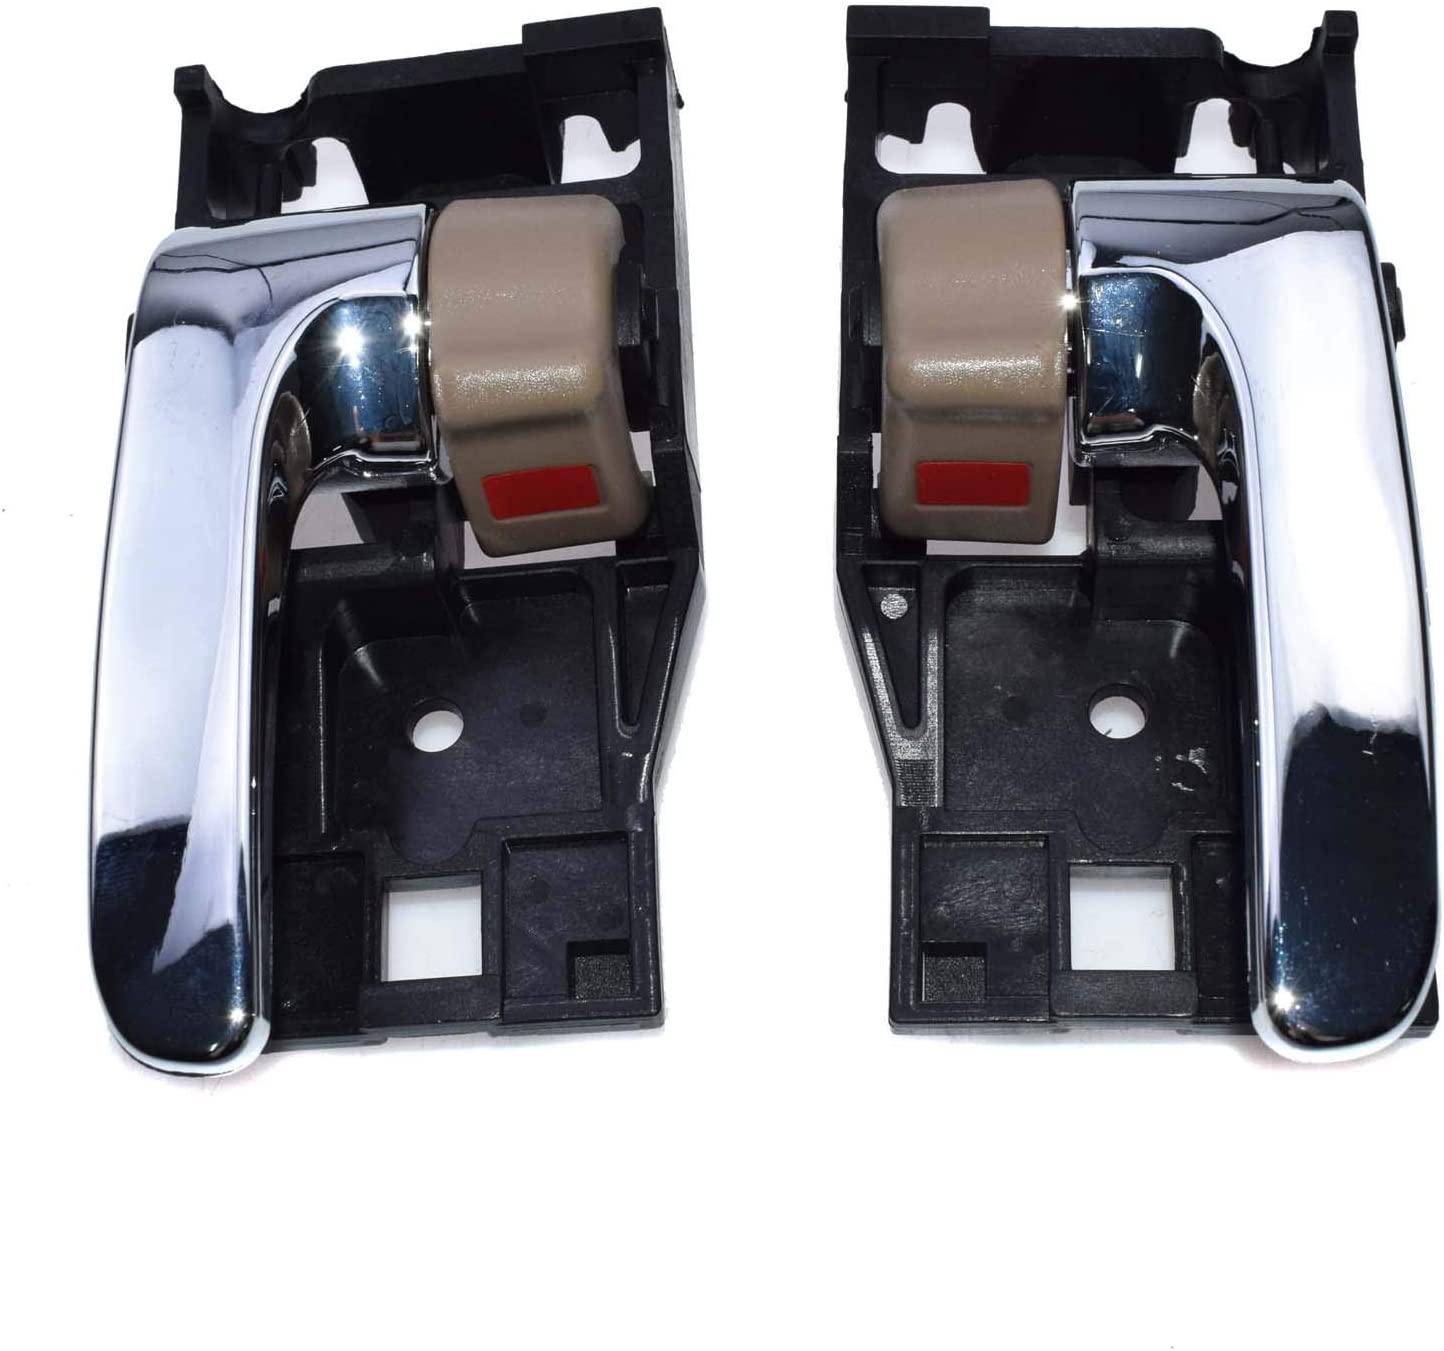 Inside Door Handles Pair Left + Right 2Pcs 69205AC010 NEW FOR Toyota Tundra Sequoia Avalon 2000-2007 69205-AC010 69206AC010